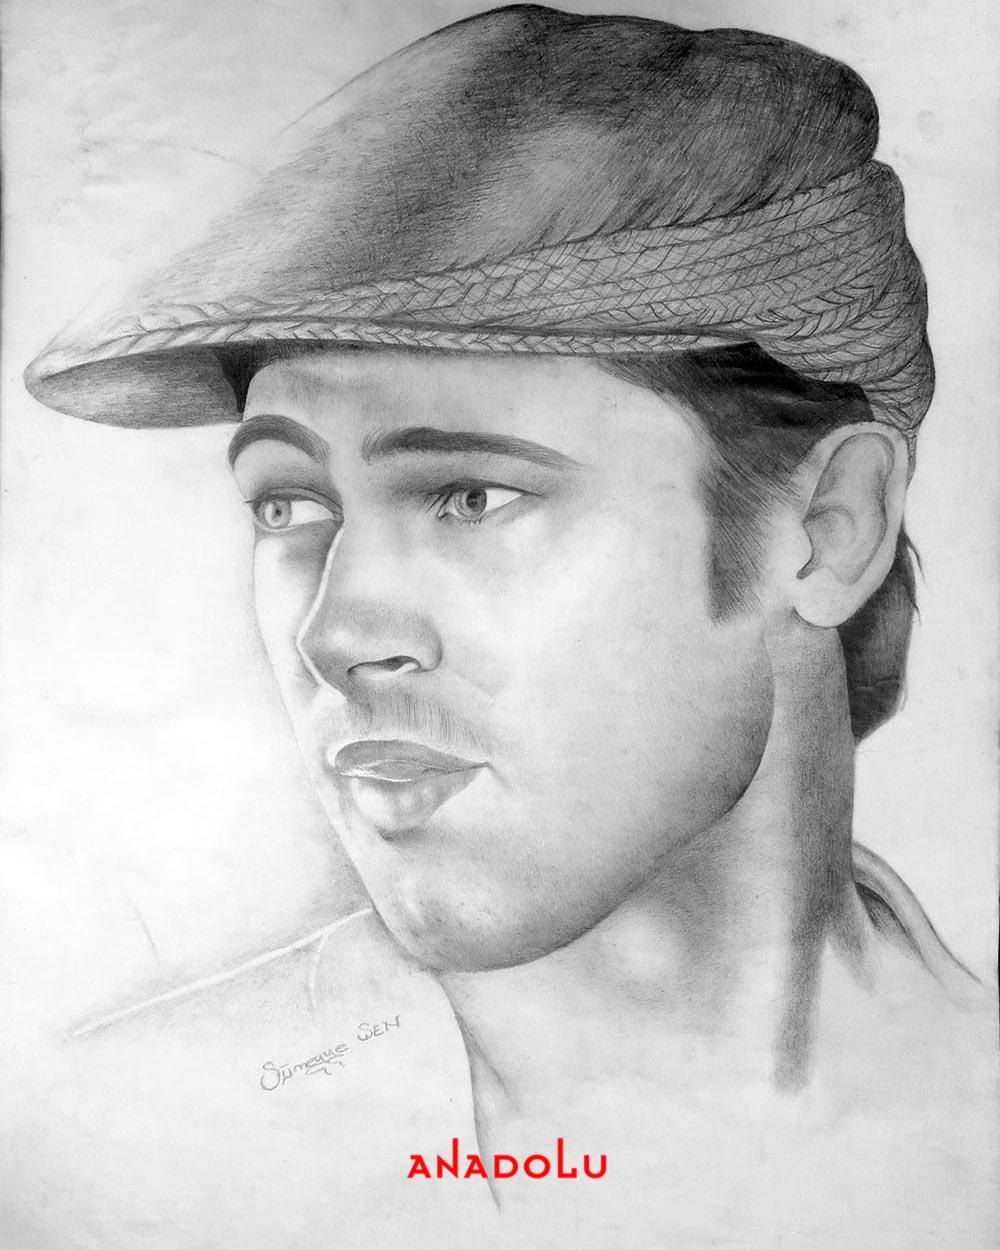 Brad Pitt Karakalem Çizimleri Diyarbakır